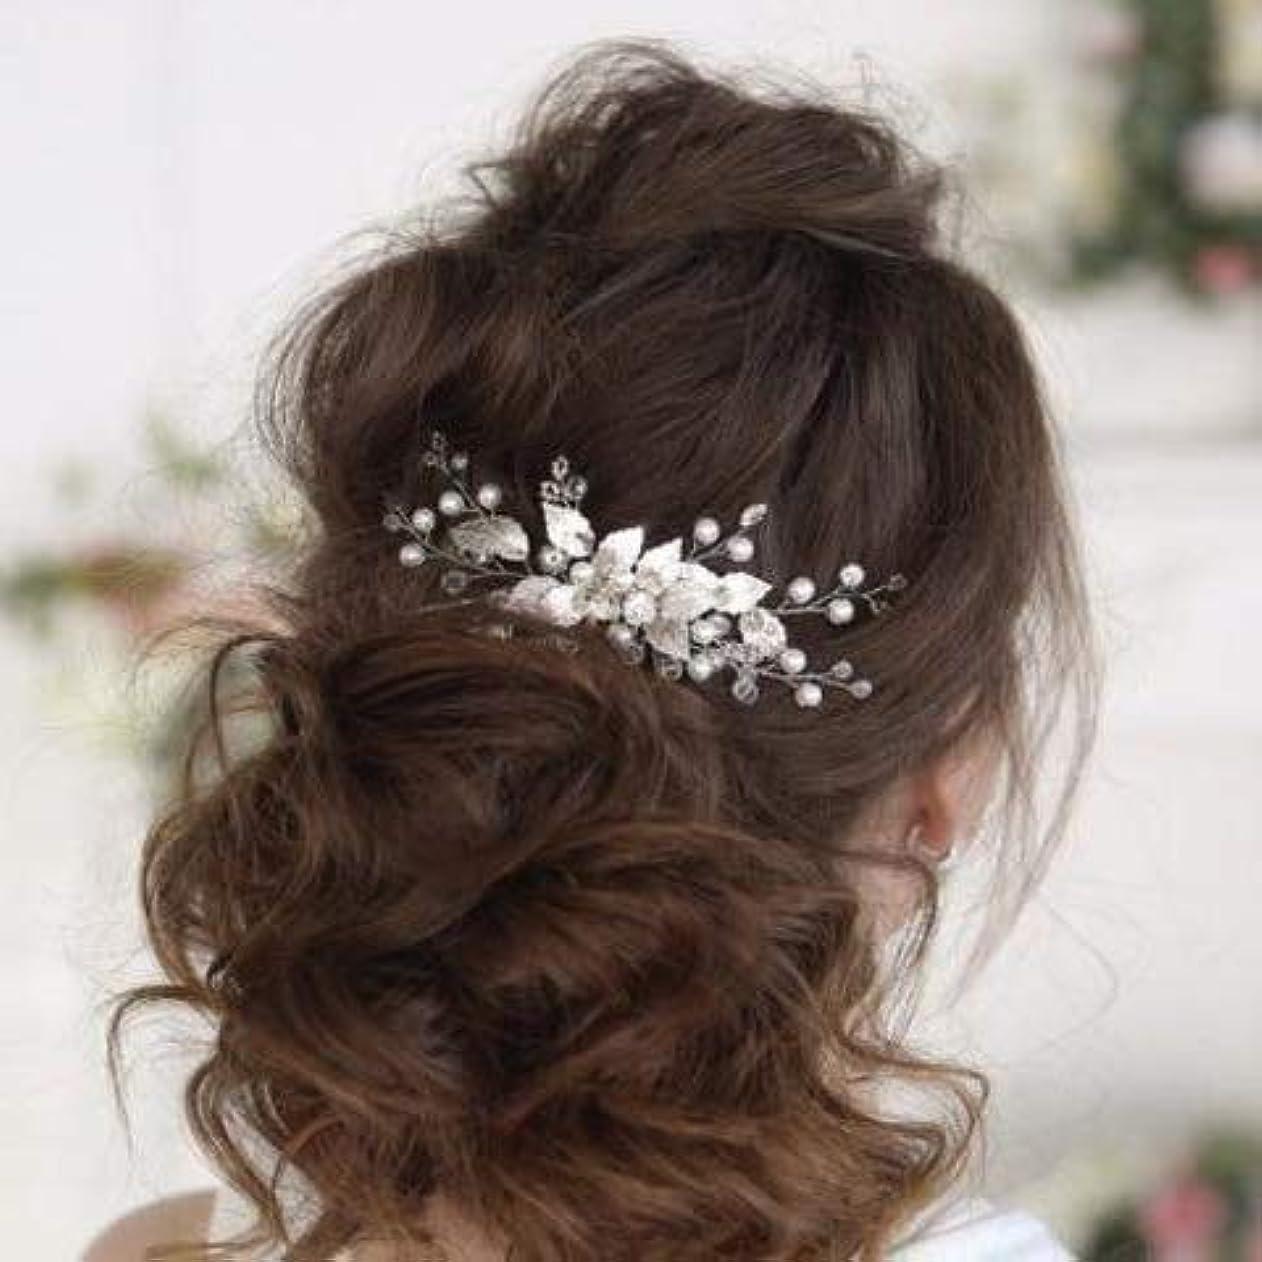 Kercisbeauty Boho Wedding Bridal Hair Comb Clips Decorative Headband with Crystal Leaf Rhinestones for Brides...